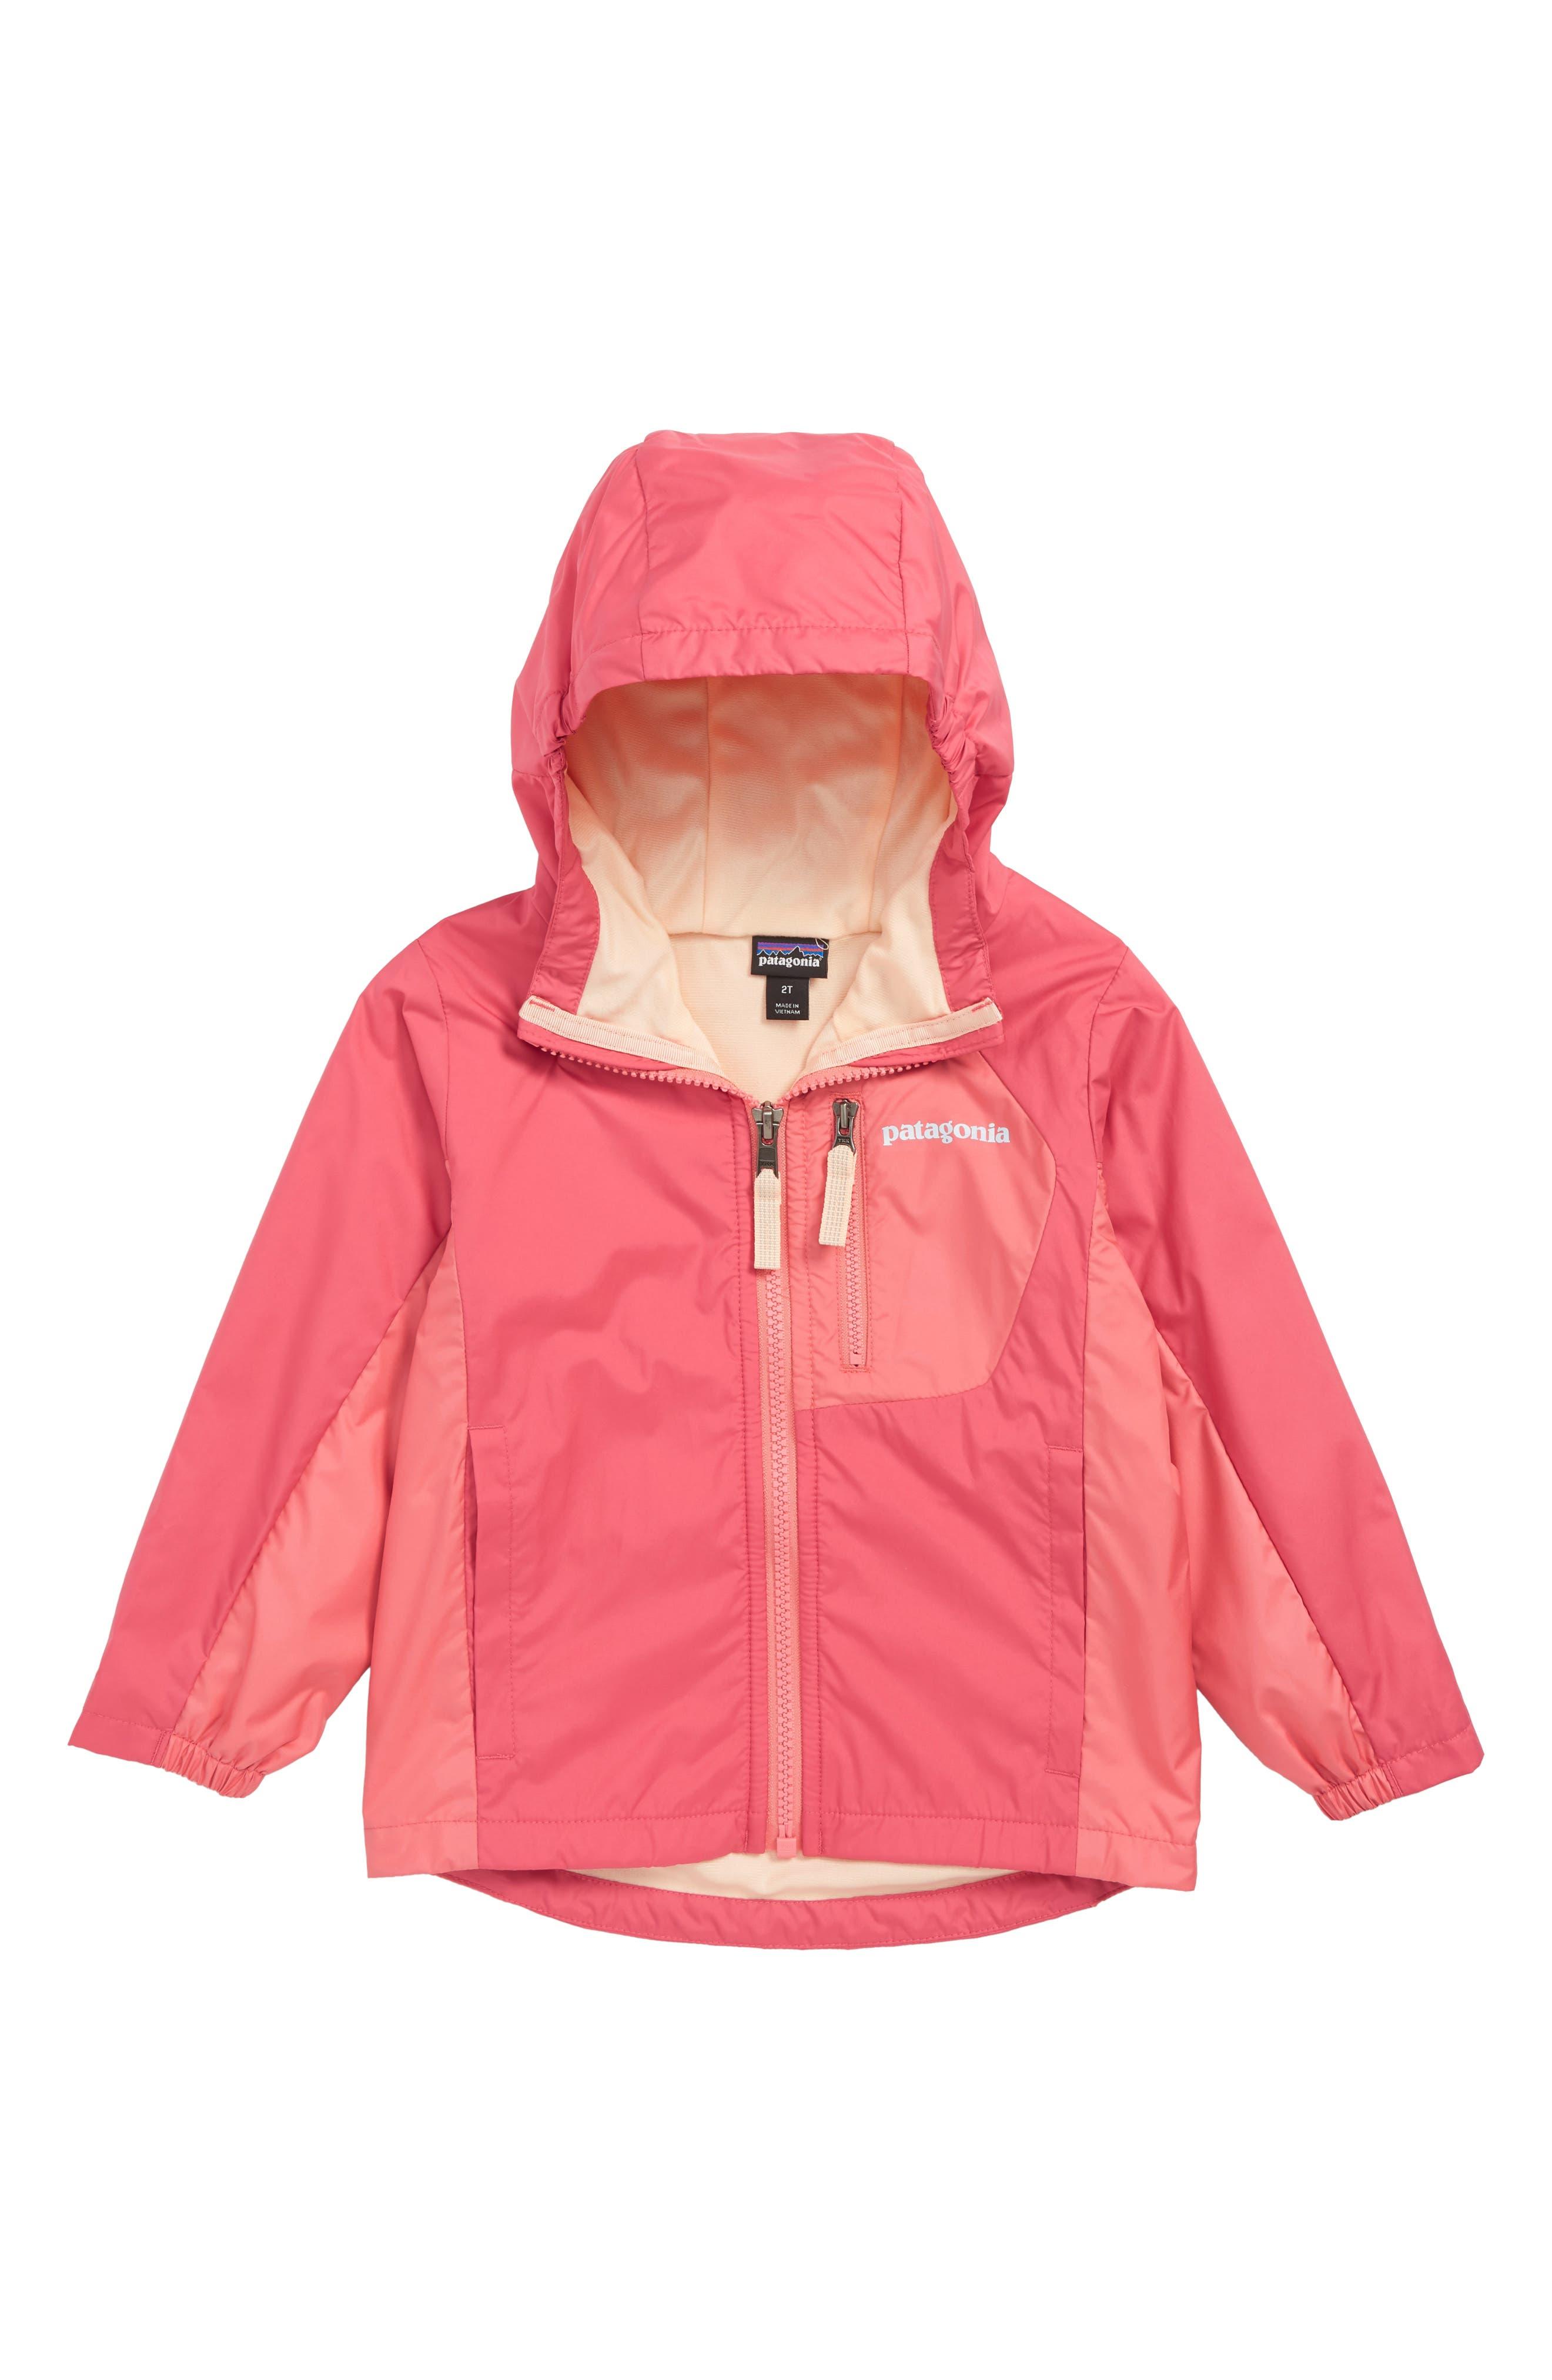 PATAGONIA, Quartzsite Hooded Jacket, Main thumbnail 1, color, REPI REEF PINK